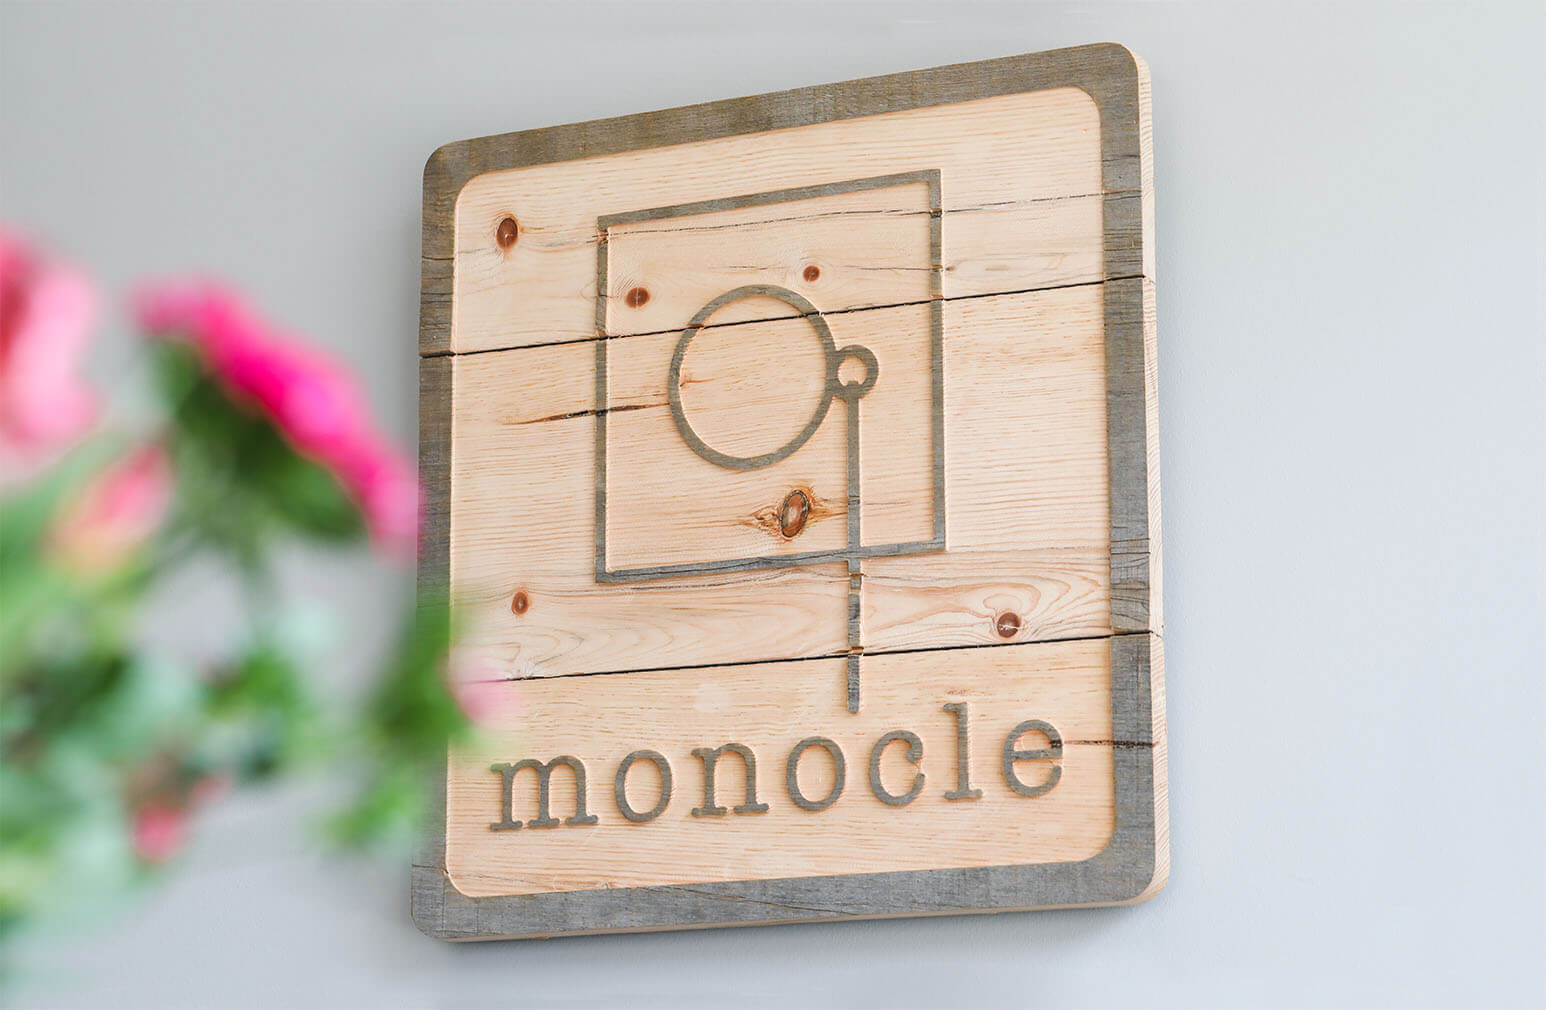 Custom logo design for Monocle Eye Care & Eyewear Gallery.